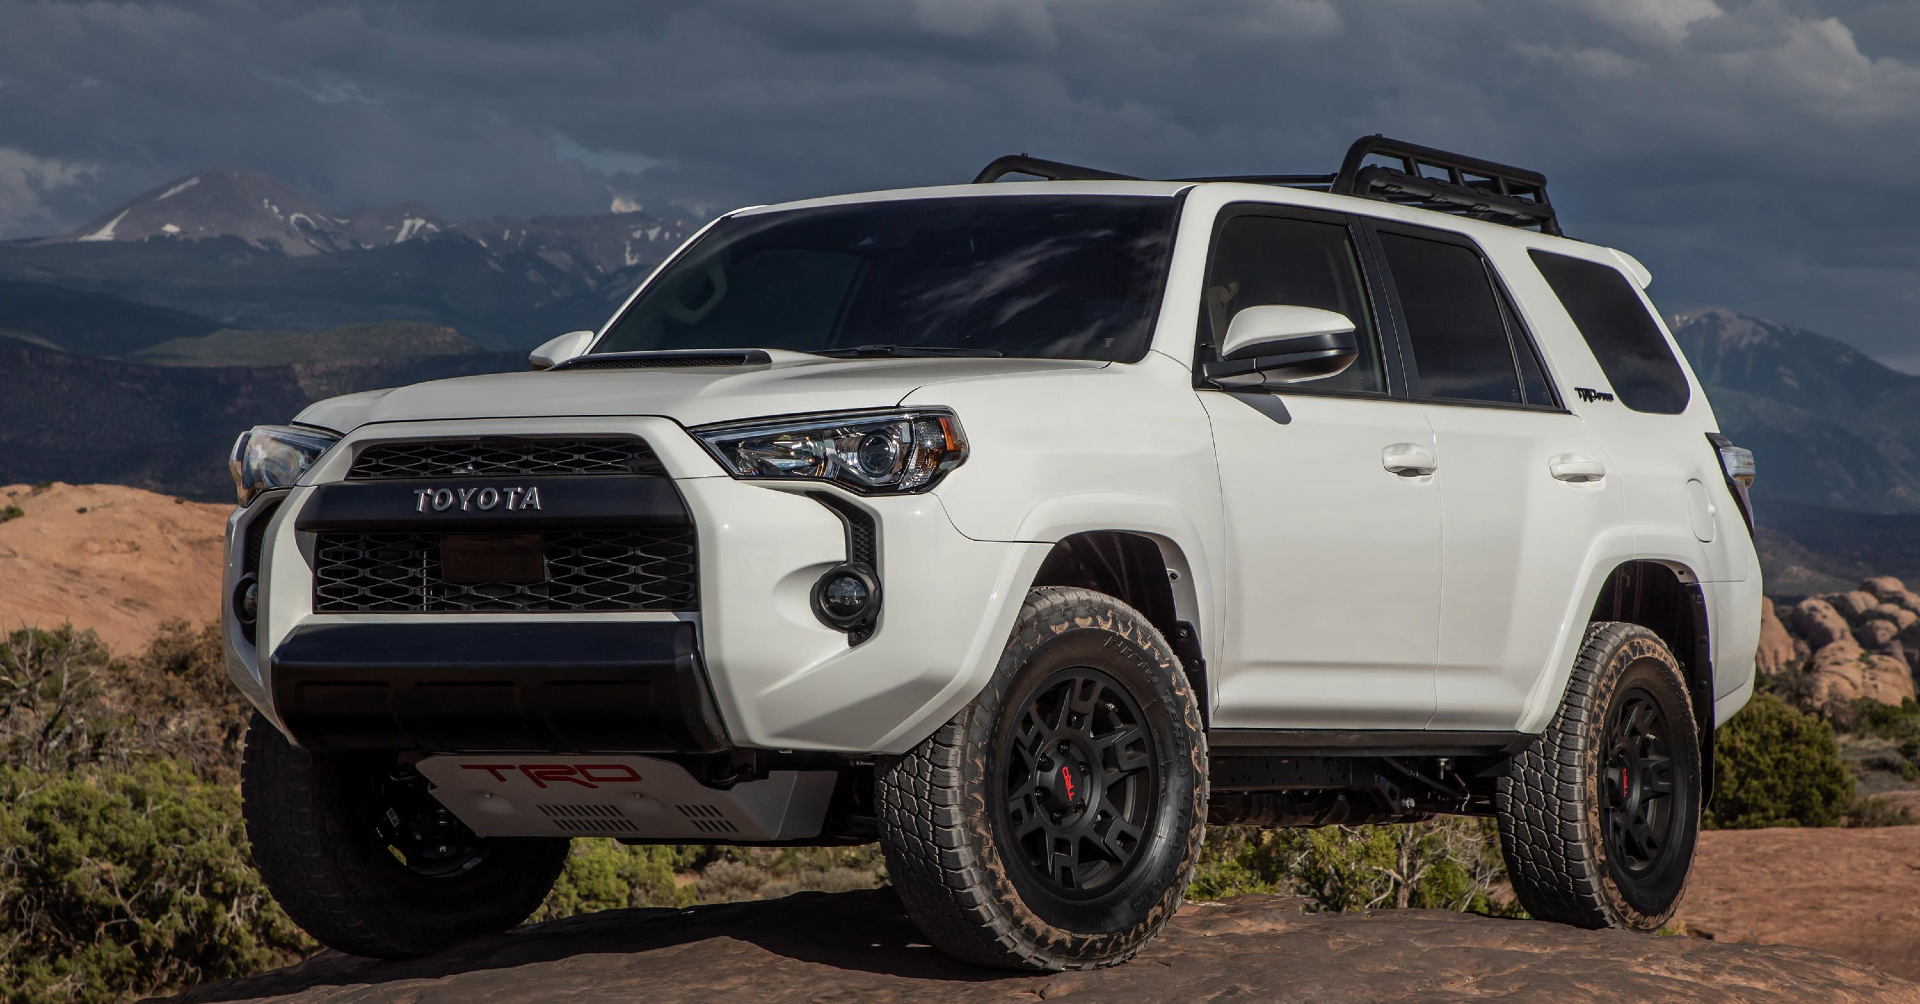 Toyota 4Runner - Advanced Tech in an Older Toyota